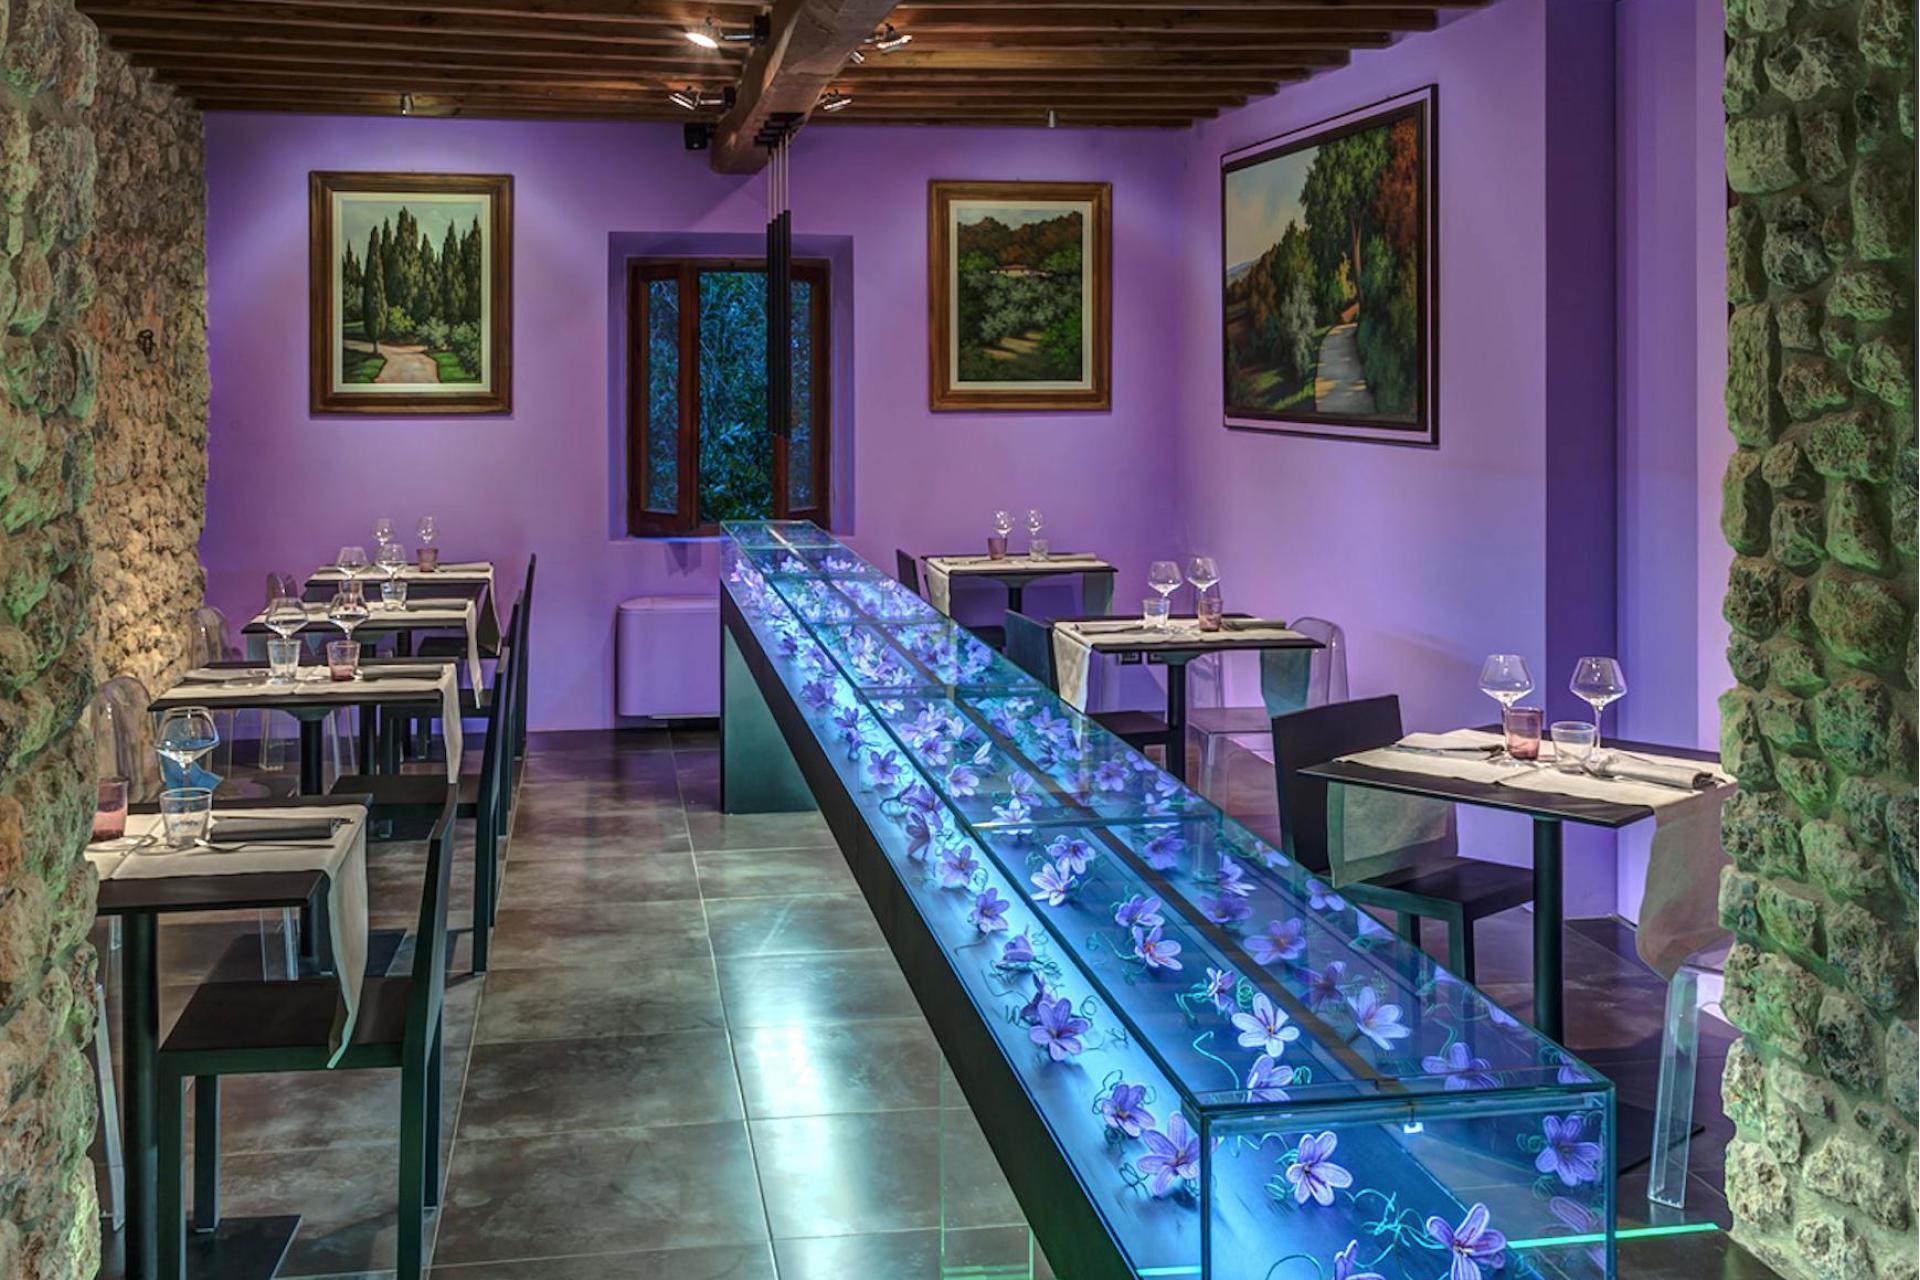 Agriturismo Comomeer en Gardameer Agriturismo Lago Maggiore, mooie kamers en restaurant